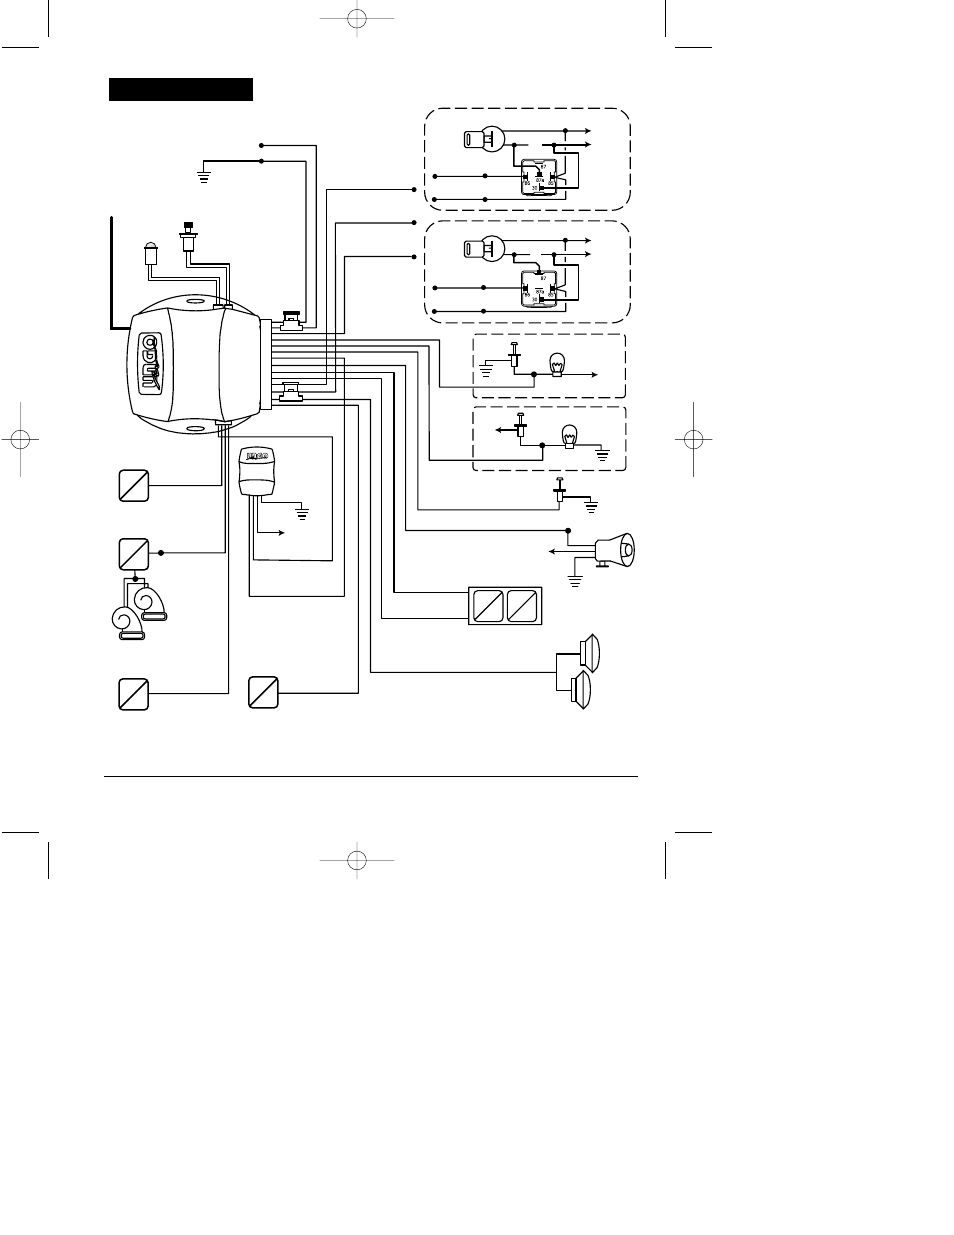 hight resolution of ungo car alarm wiring diagram